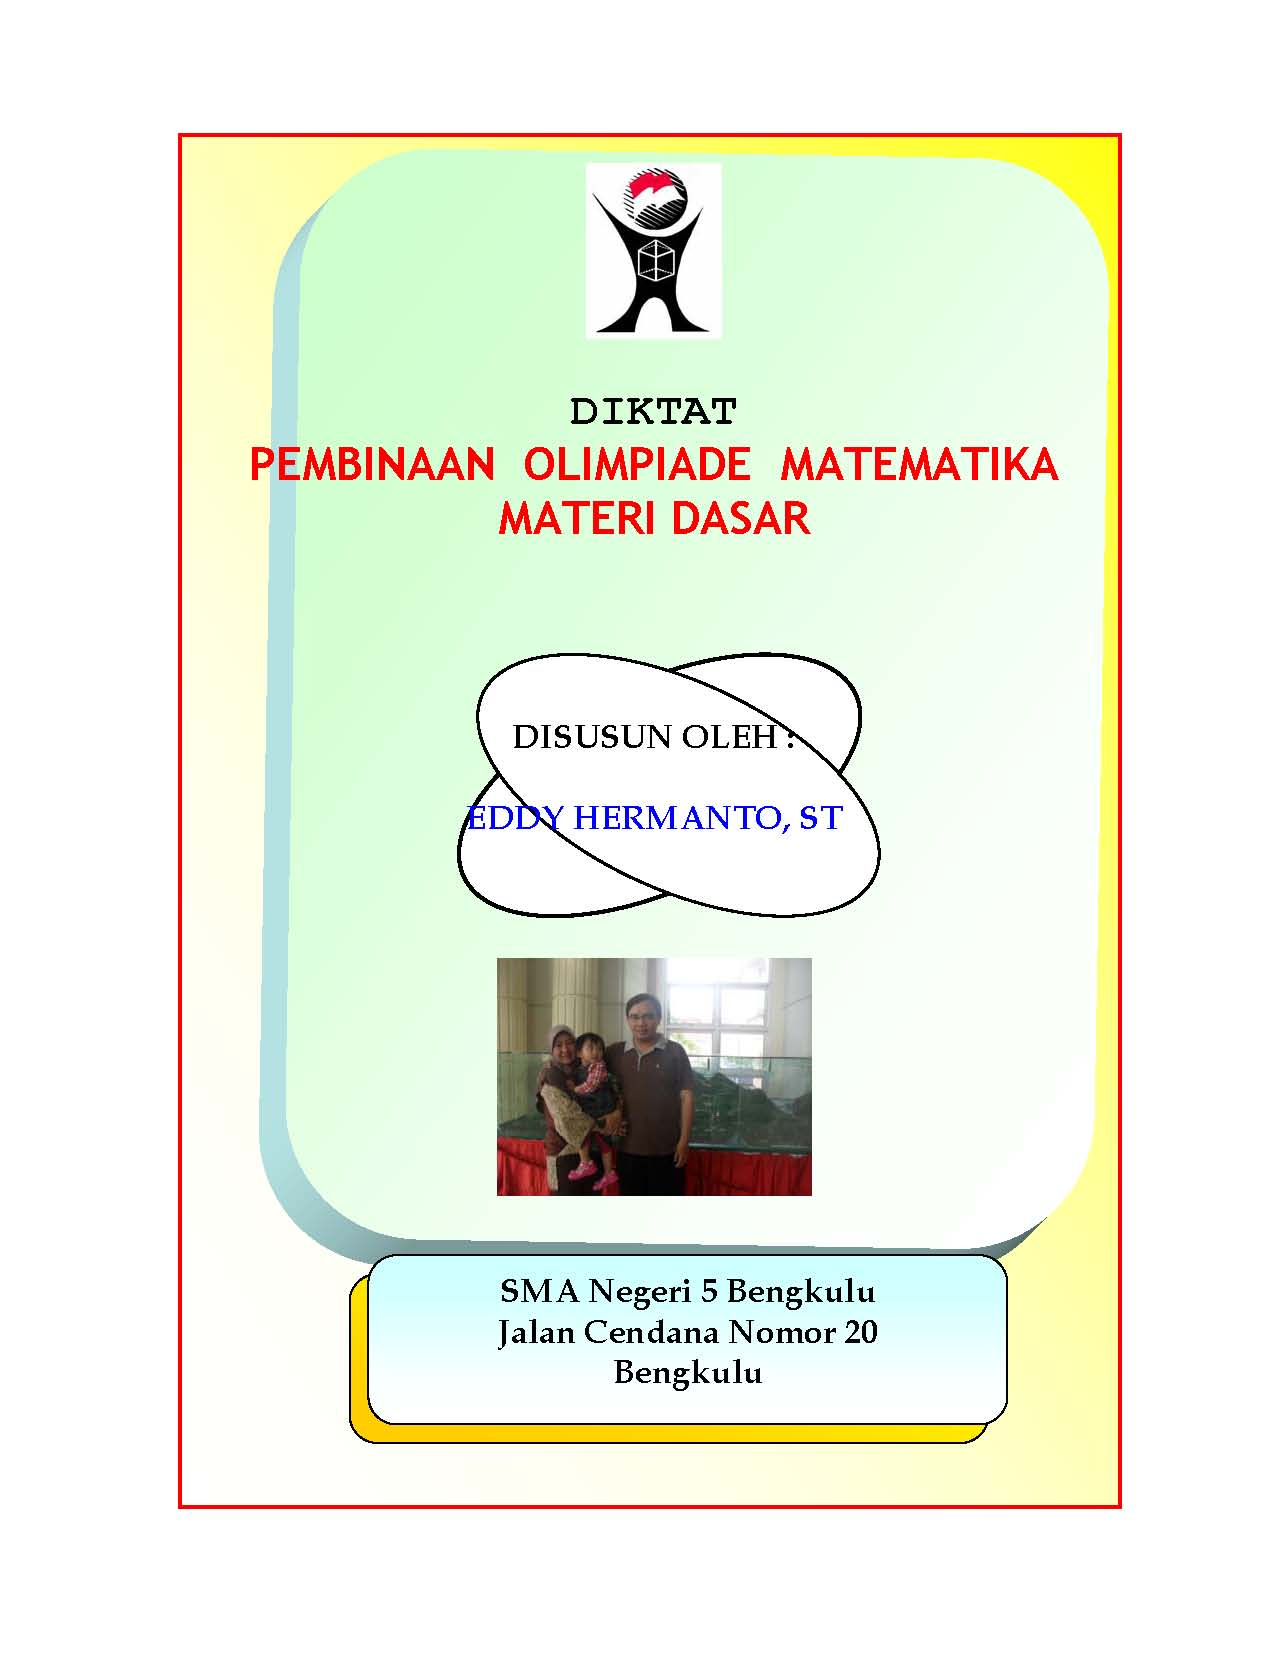 Download Silabus Rpp Ktsp 2011 Seni Budaya Dan Share The Knownledge